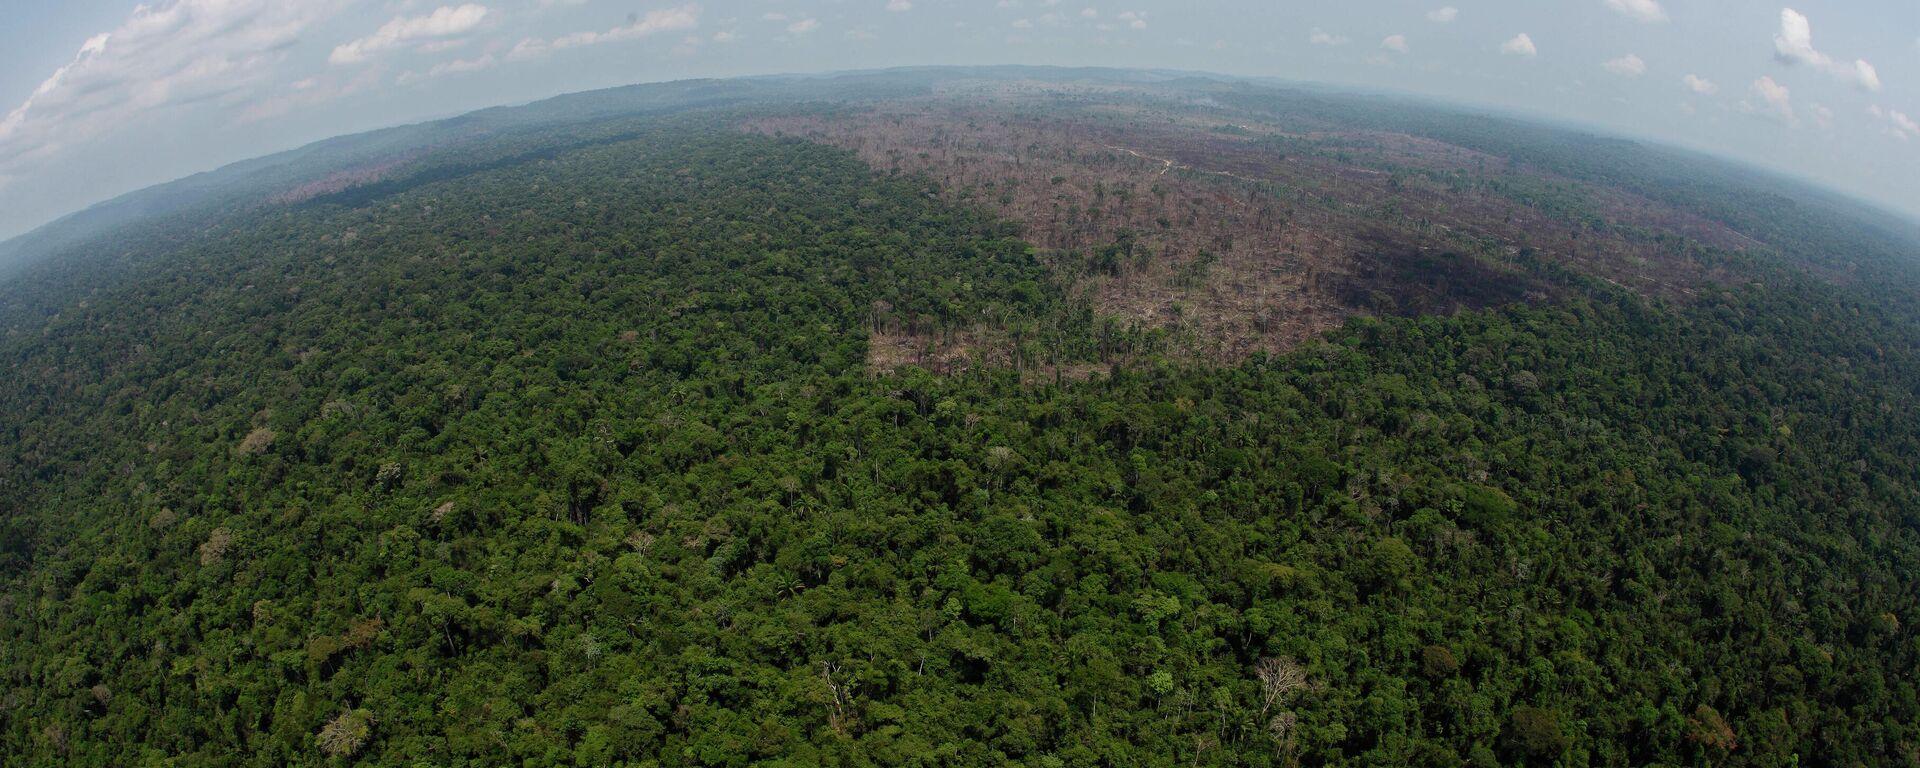 Amazonas-Regenwald - SNA, 1920, 06.08.2021